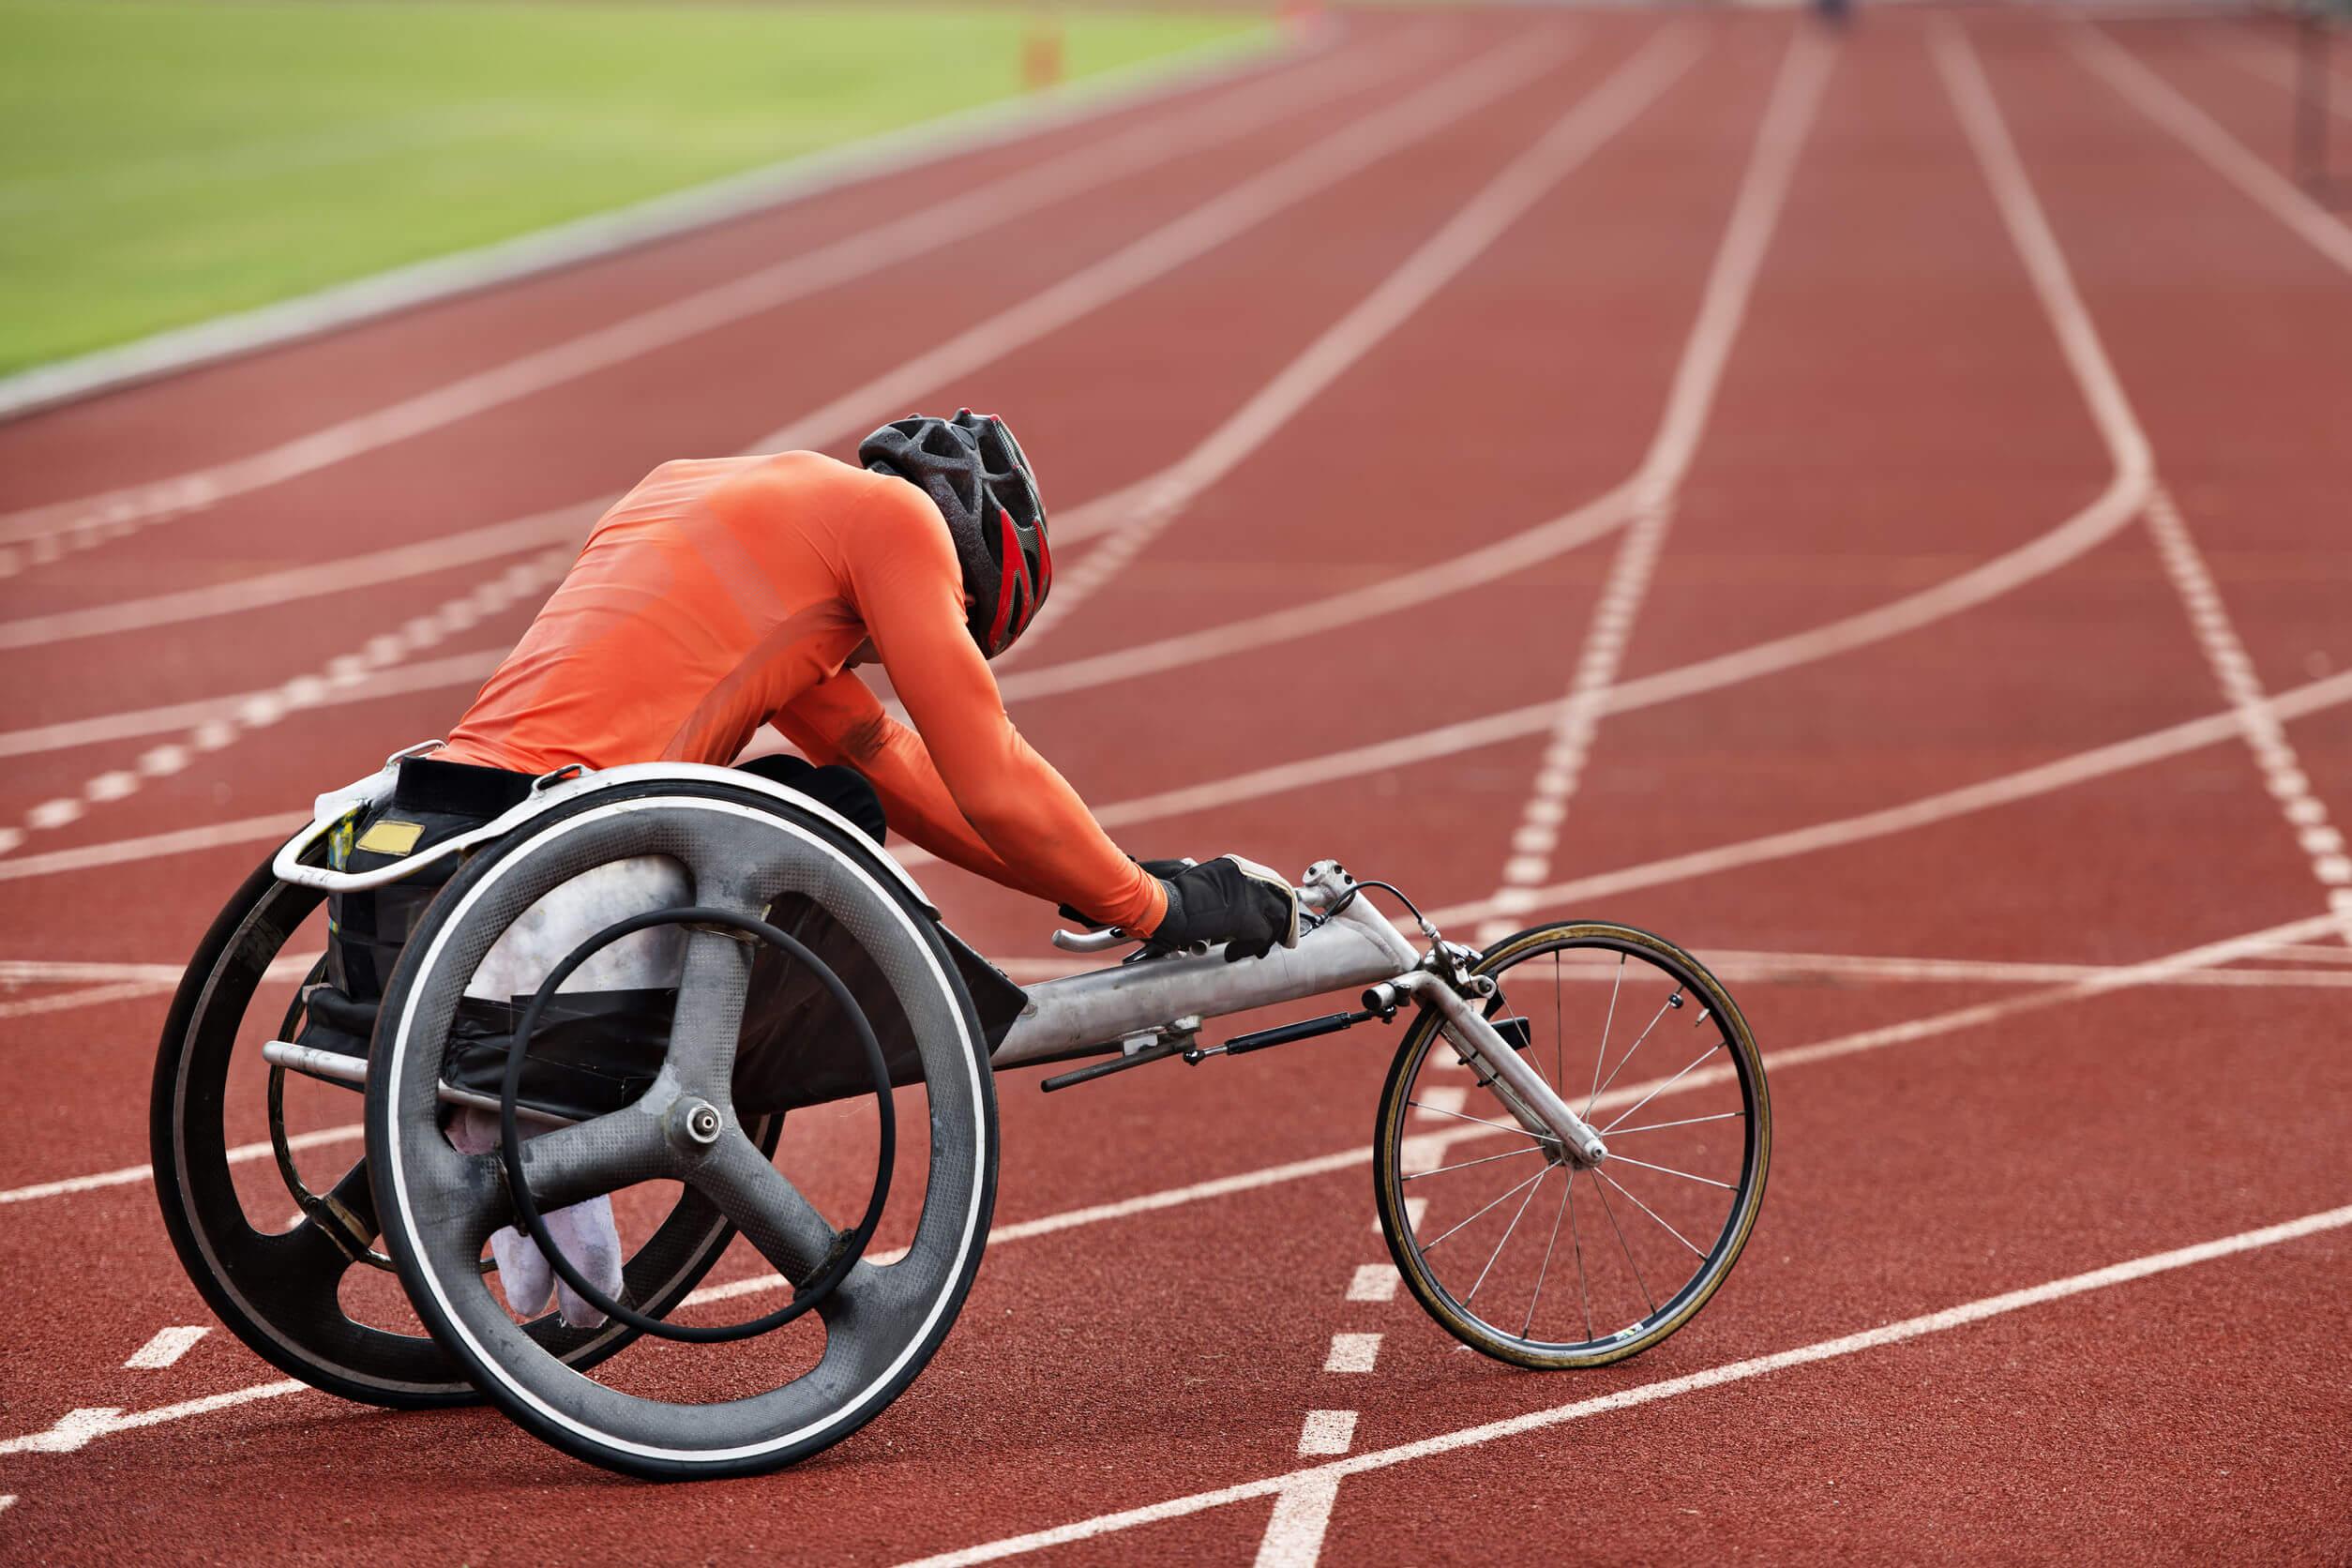 mySupply supports Parasport Danmark 2018